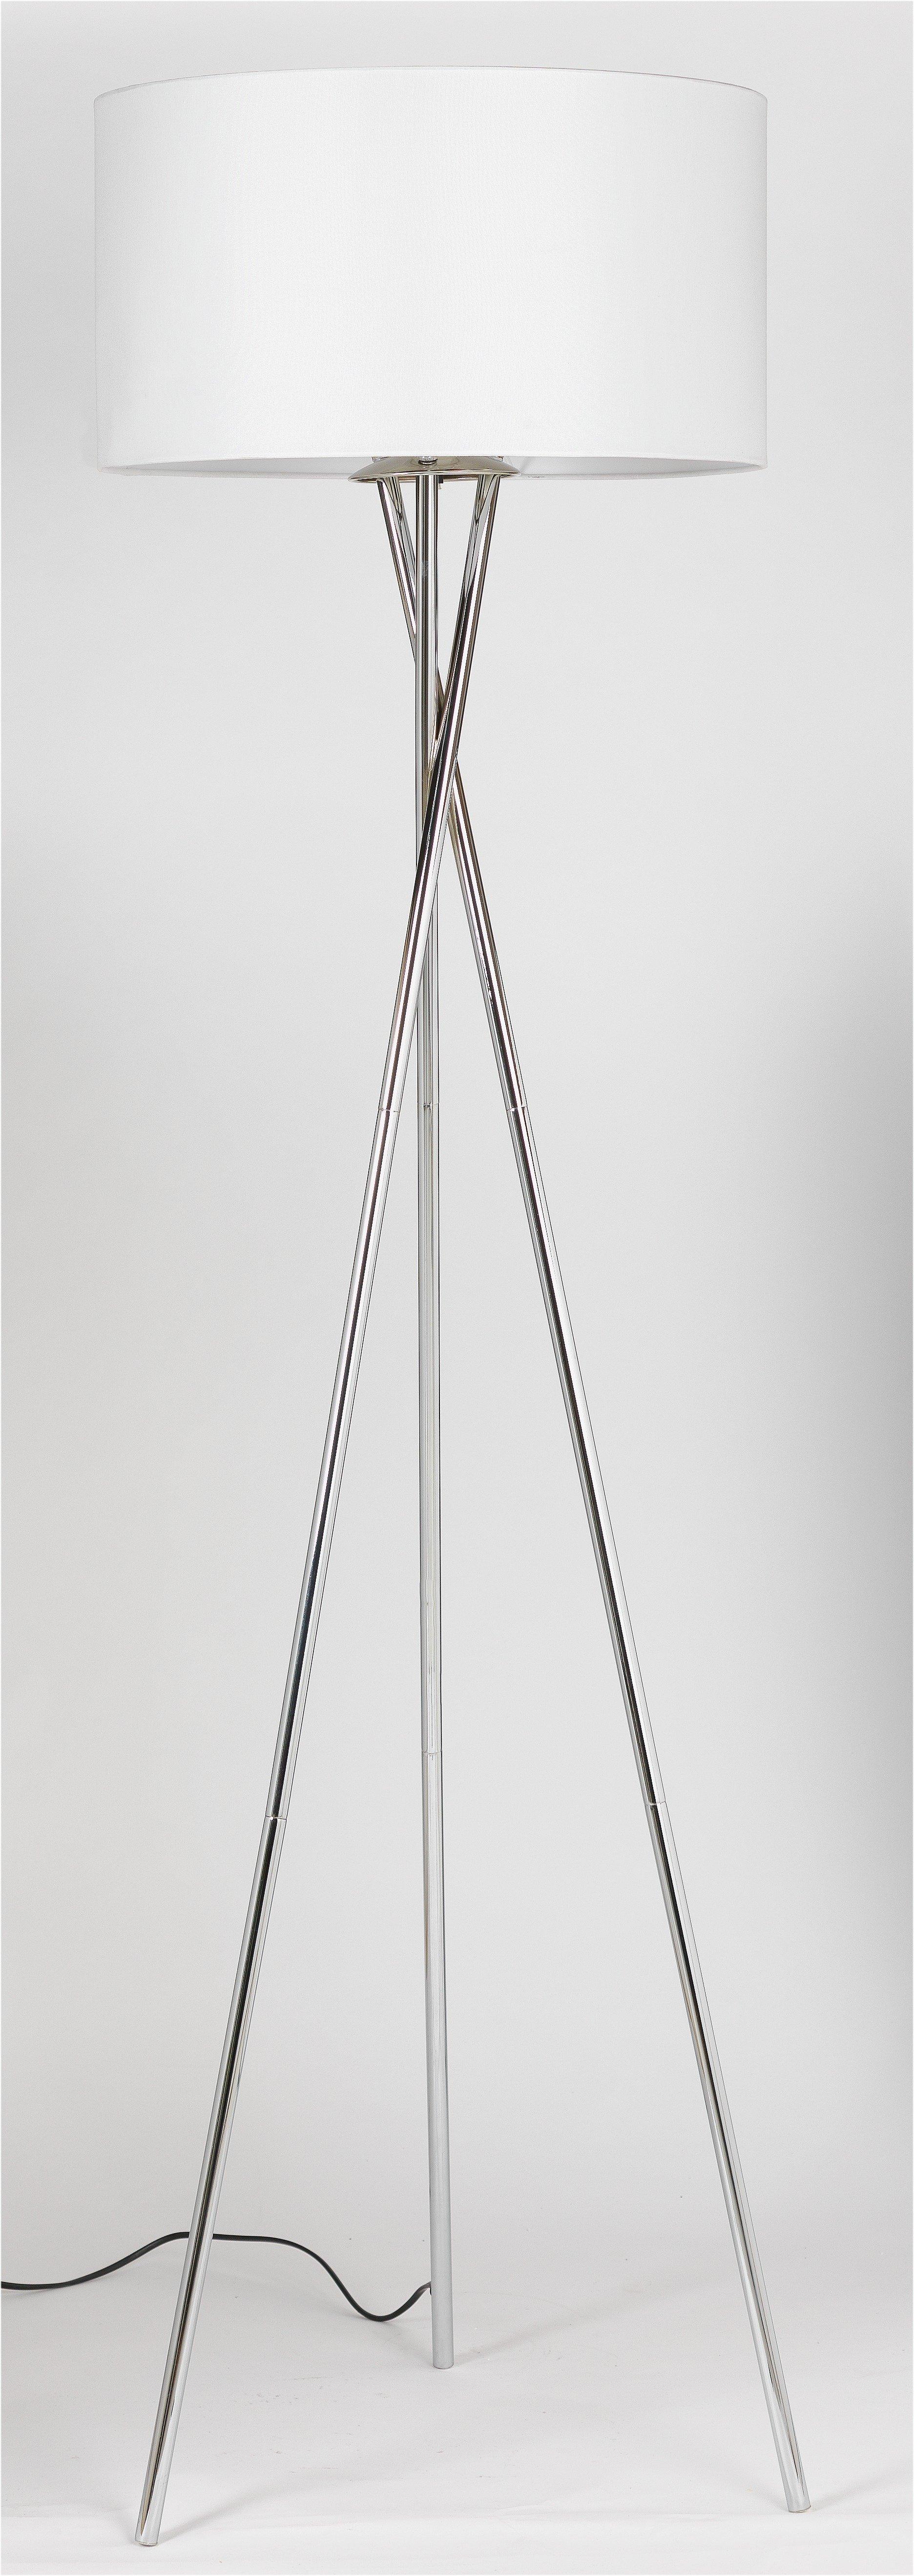 hygena chrome tripod floor lamp white